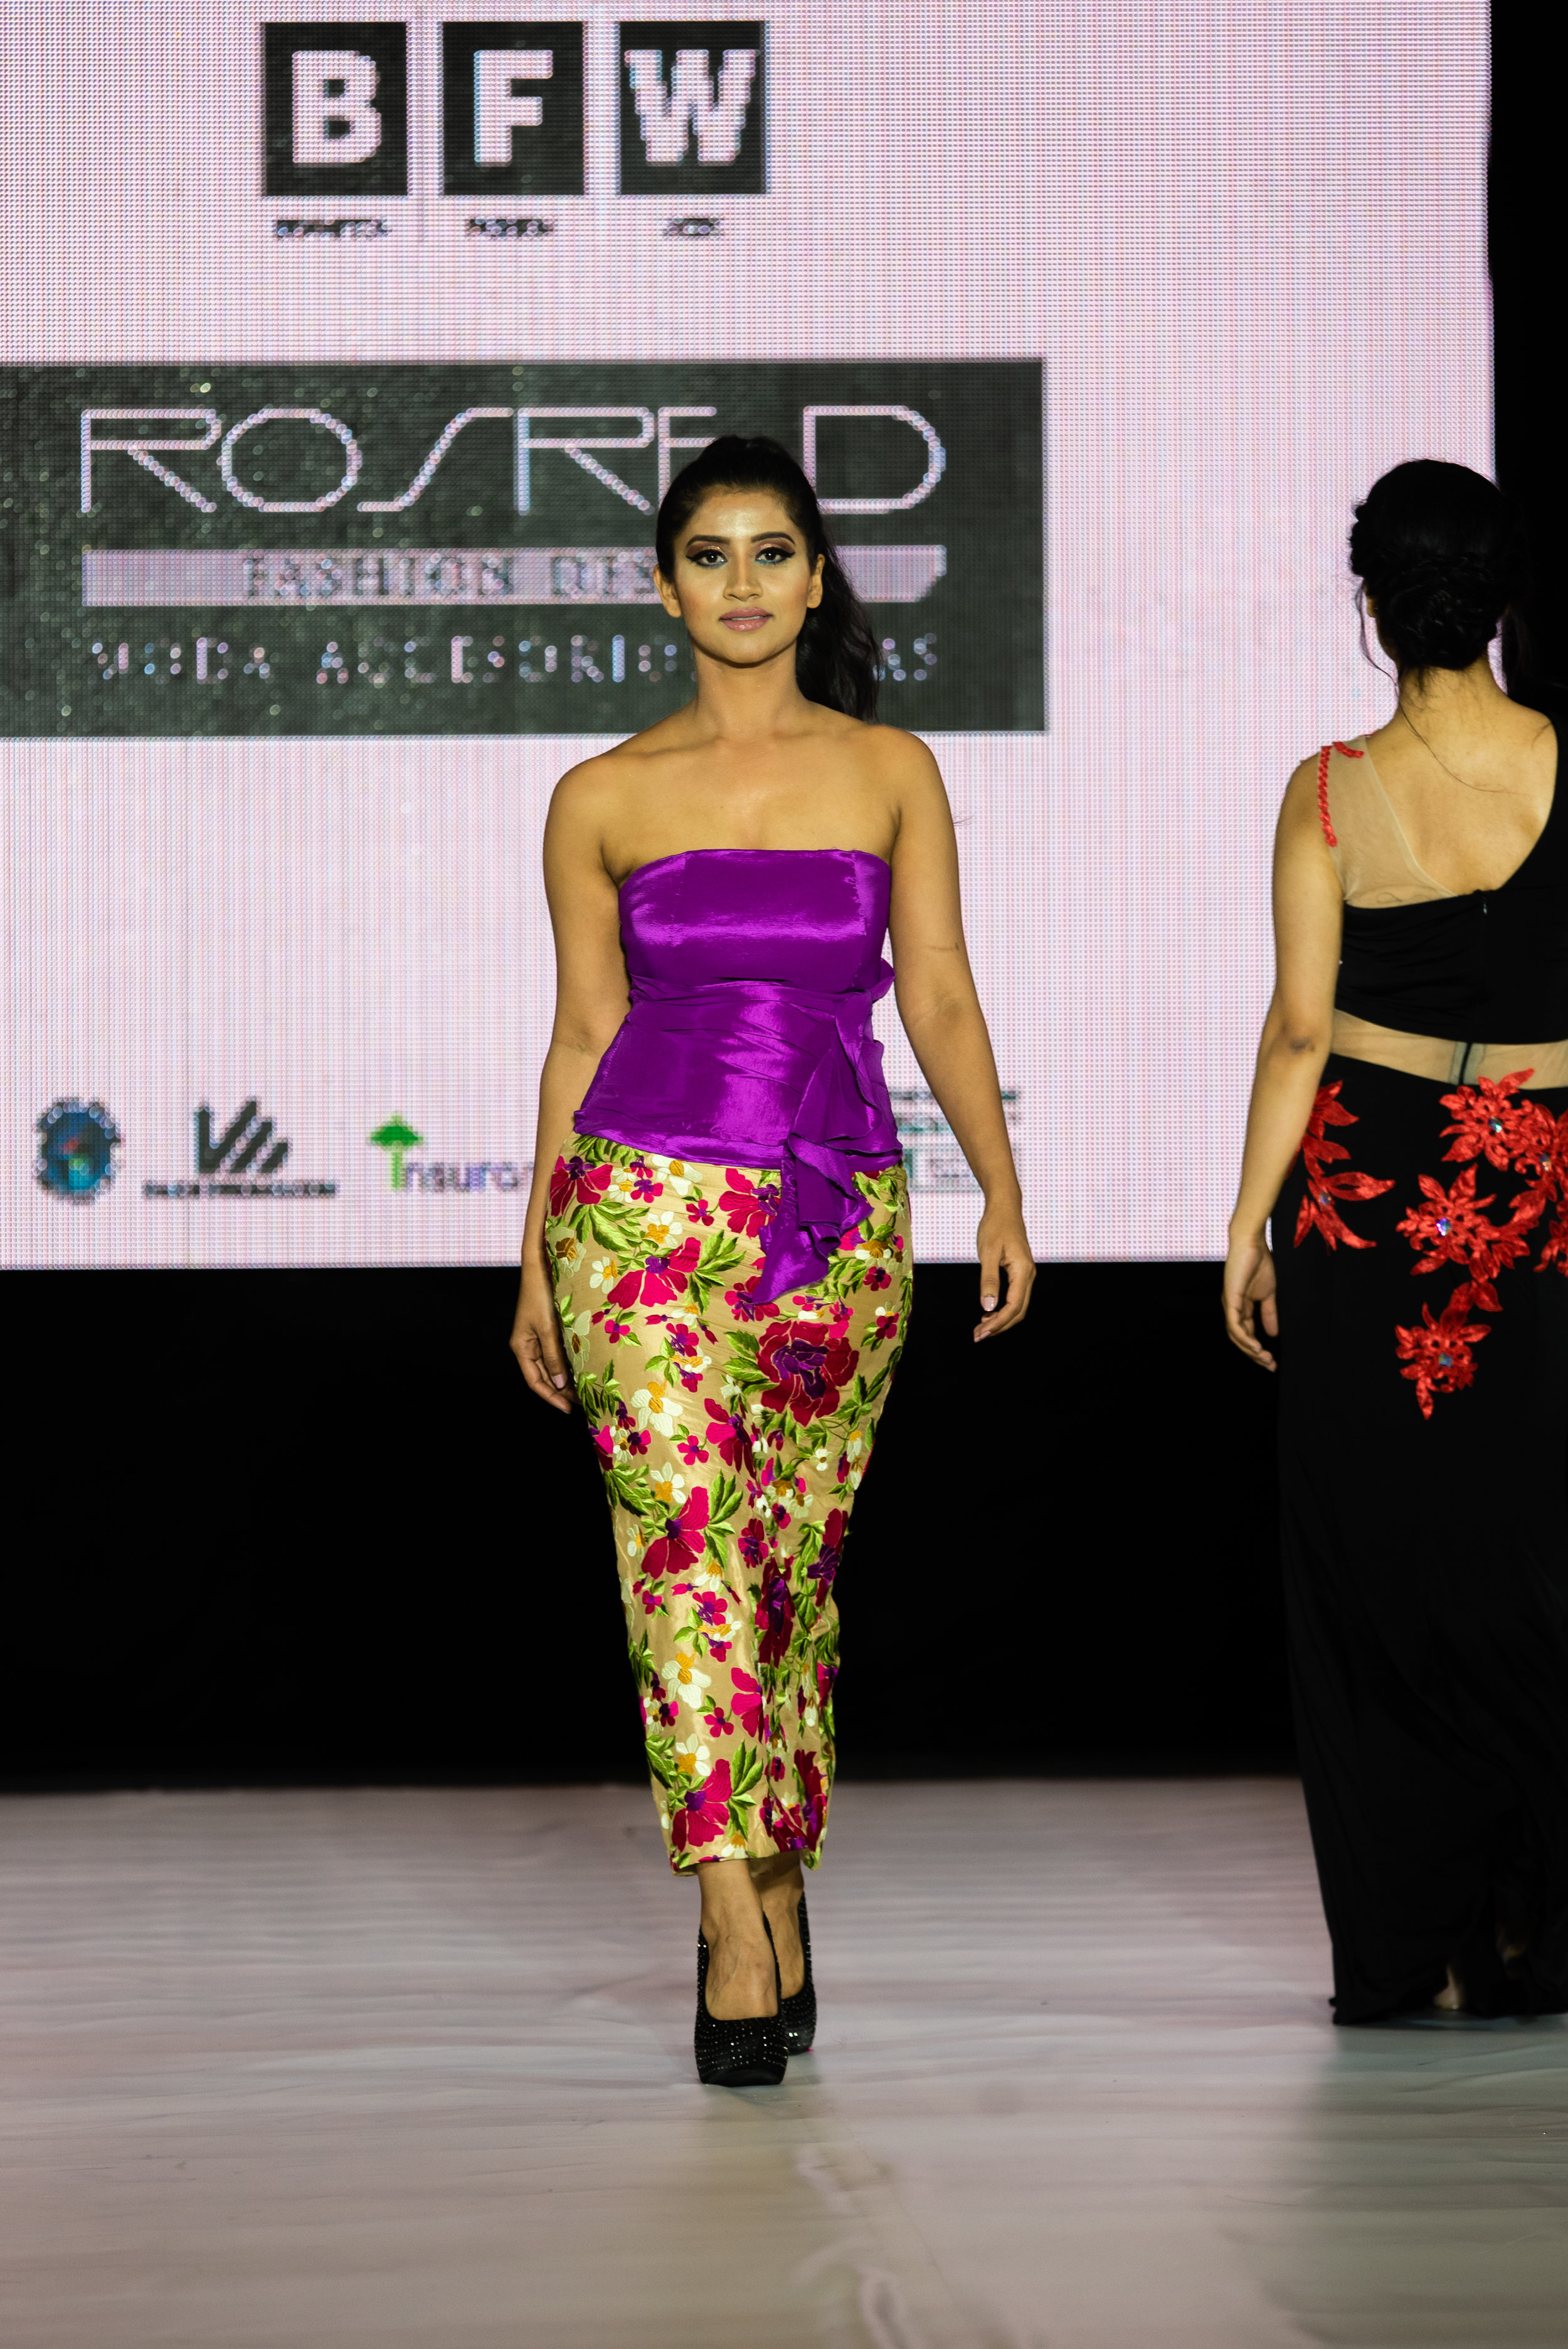 BFW10 - Rosred Fashion Design-SKN_5046.jpg